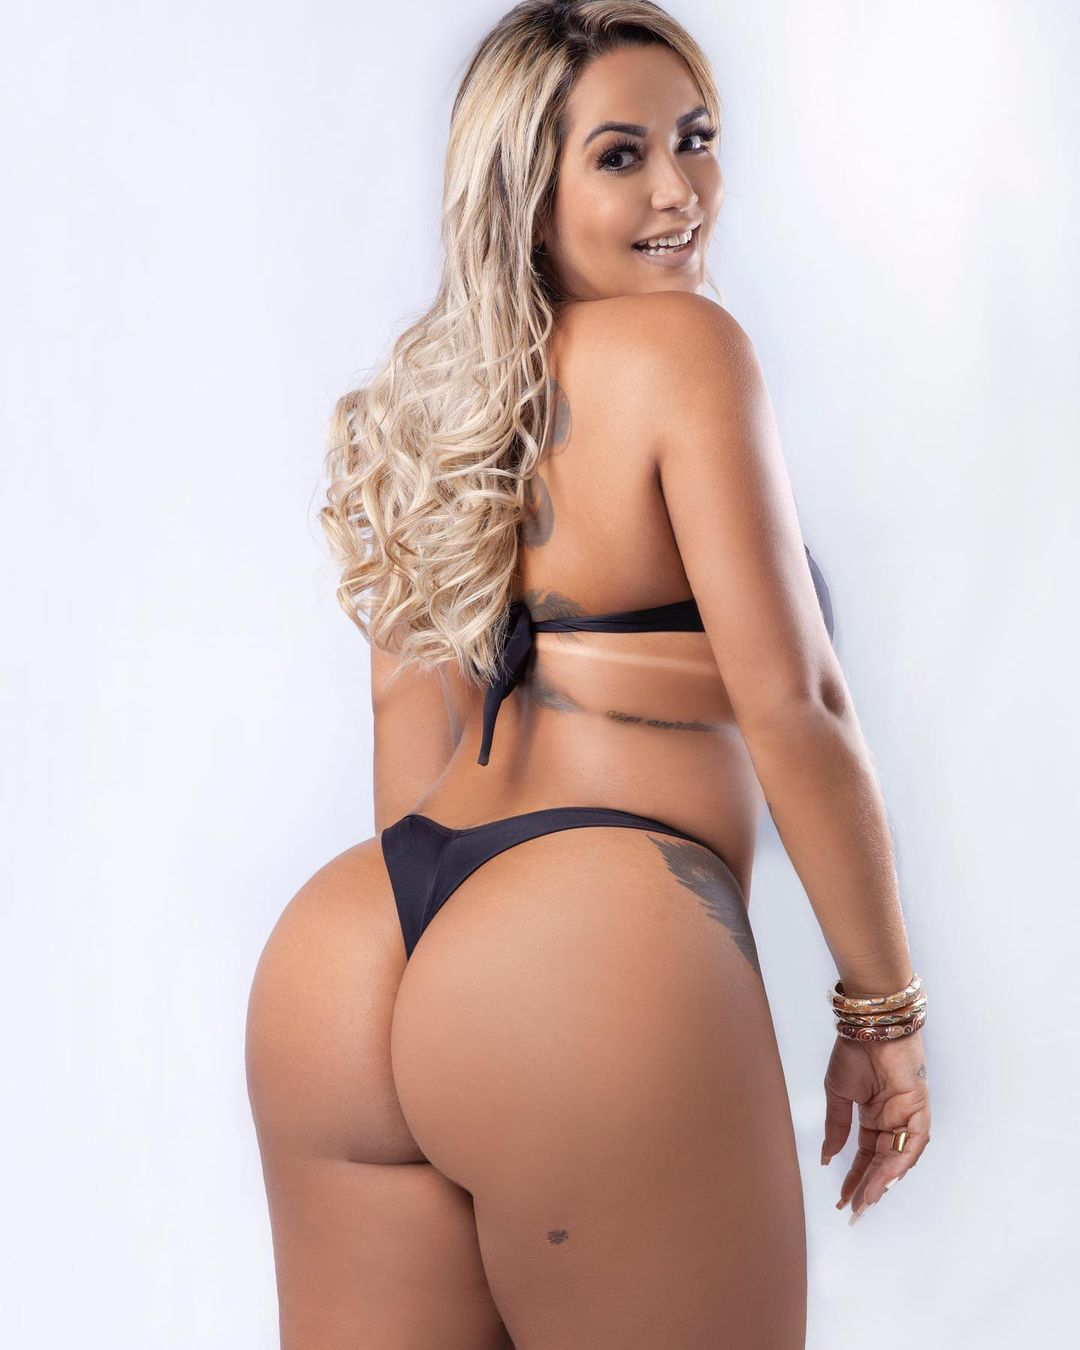 Gabi Olympio vai representar o Rio Grande do Norte no Miss Bumbum 2021